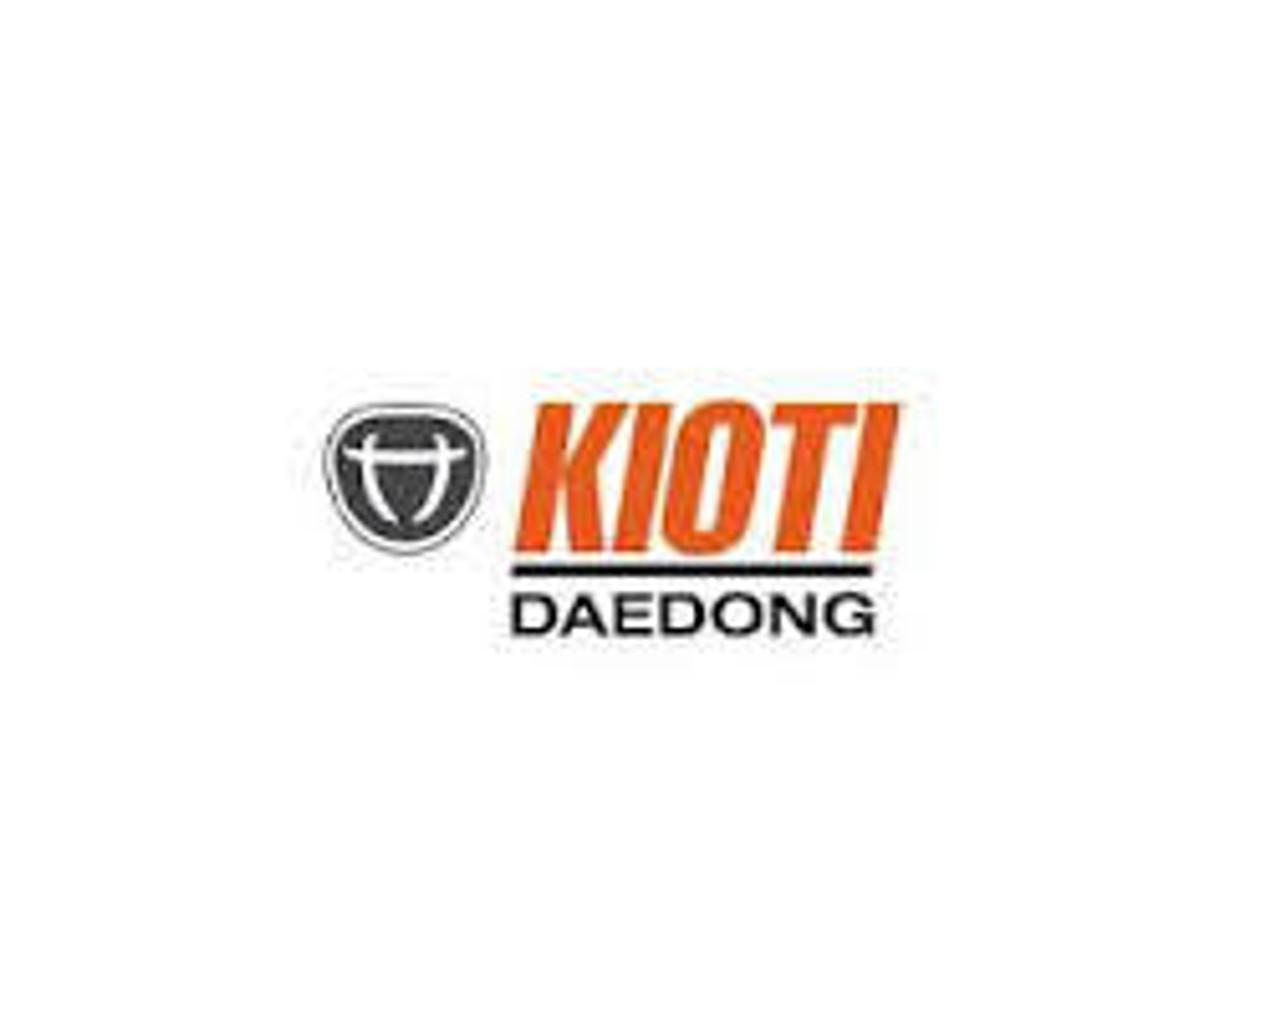 Kioti Daedong